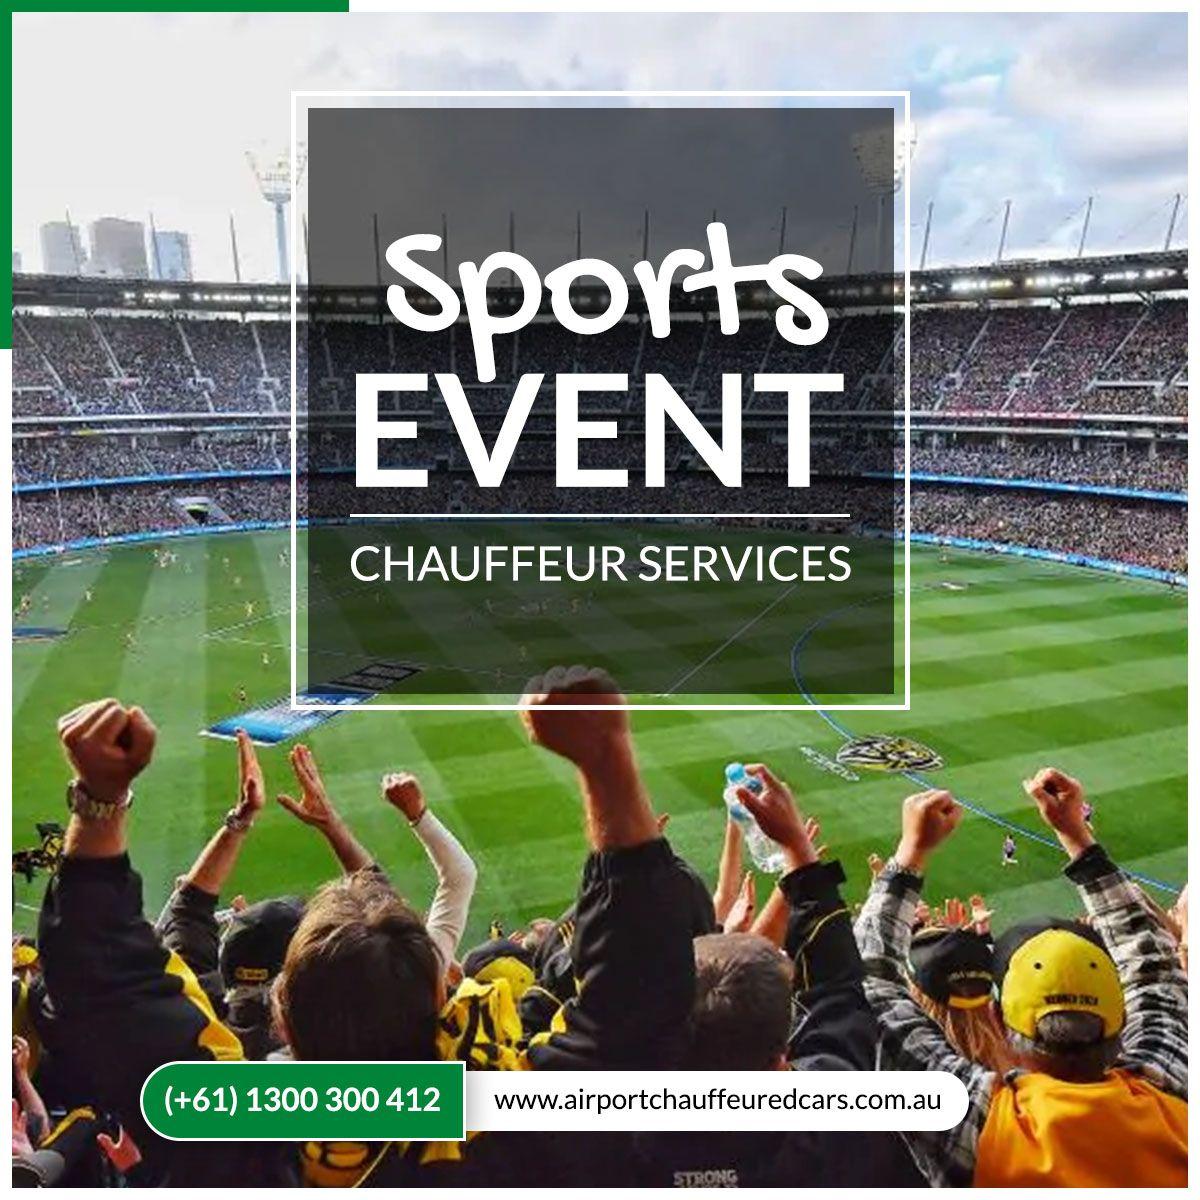 Sports Event Chauffeur Services Chauffeur service